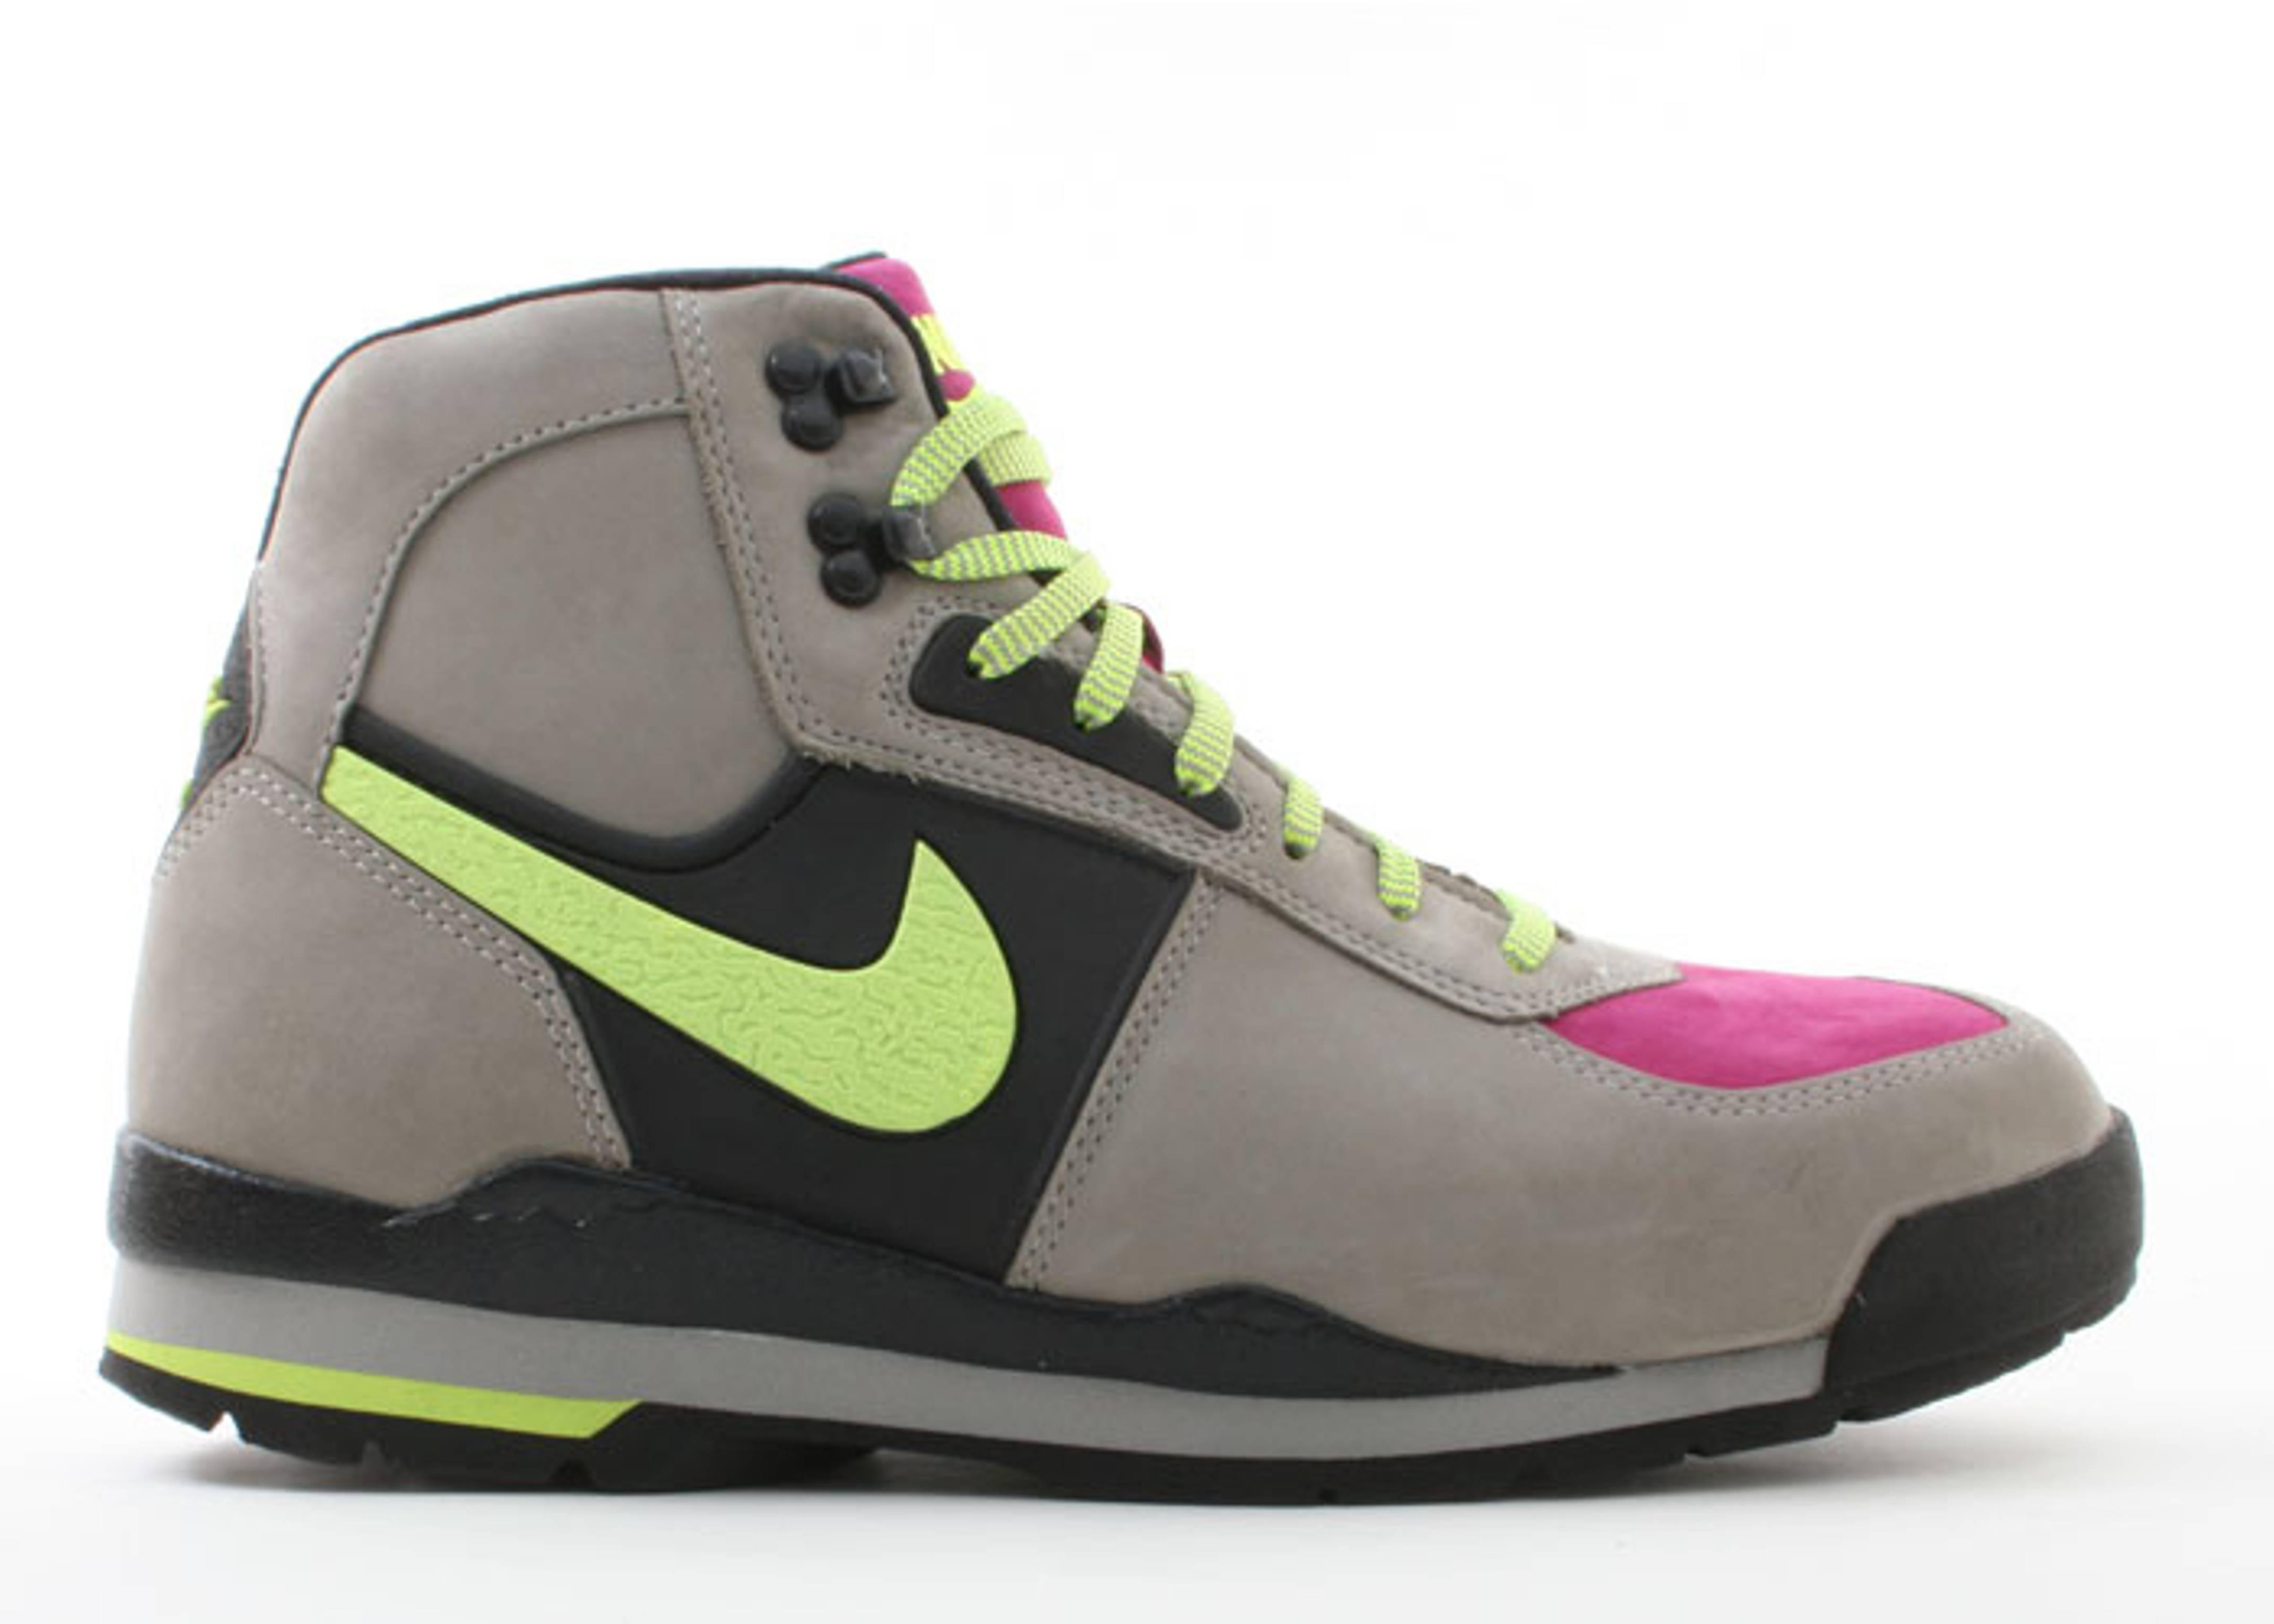 promo code c7d8d d62e4 Air Baltoro - Nike - 311093 071 - medium greyvoltage-raspberry red   Flight Club